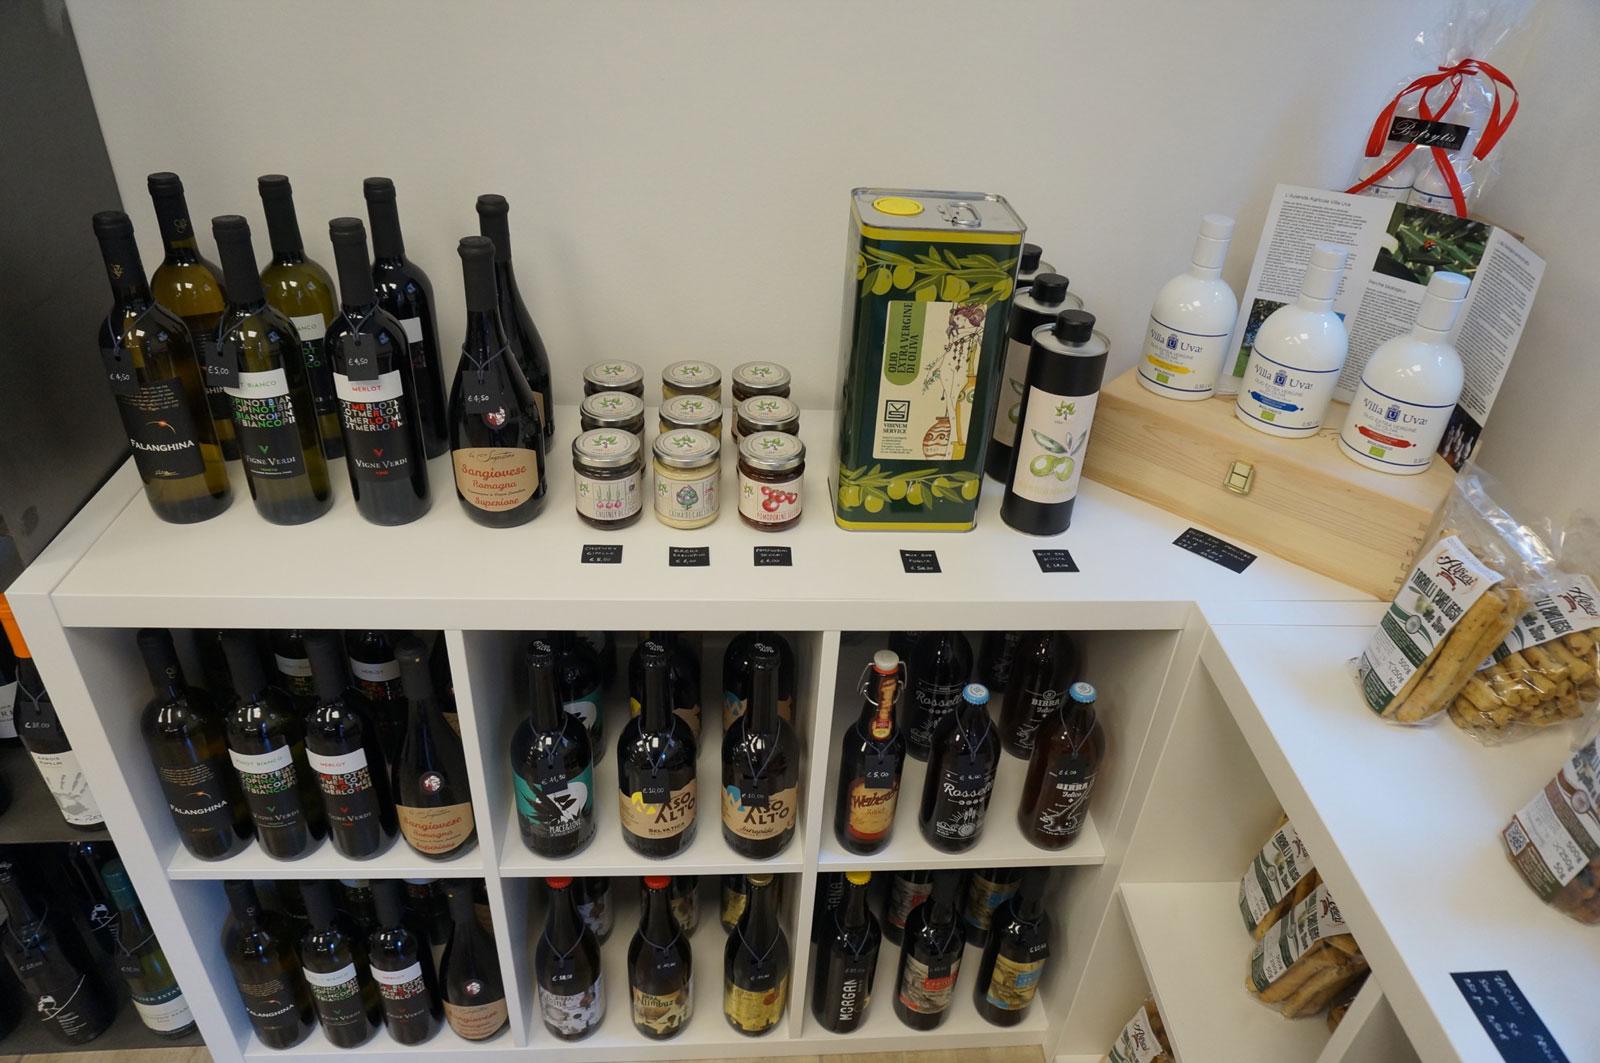 botrytis enoteca vini birre olio extravergine d'oliva